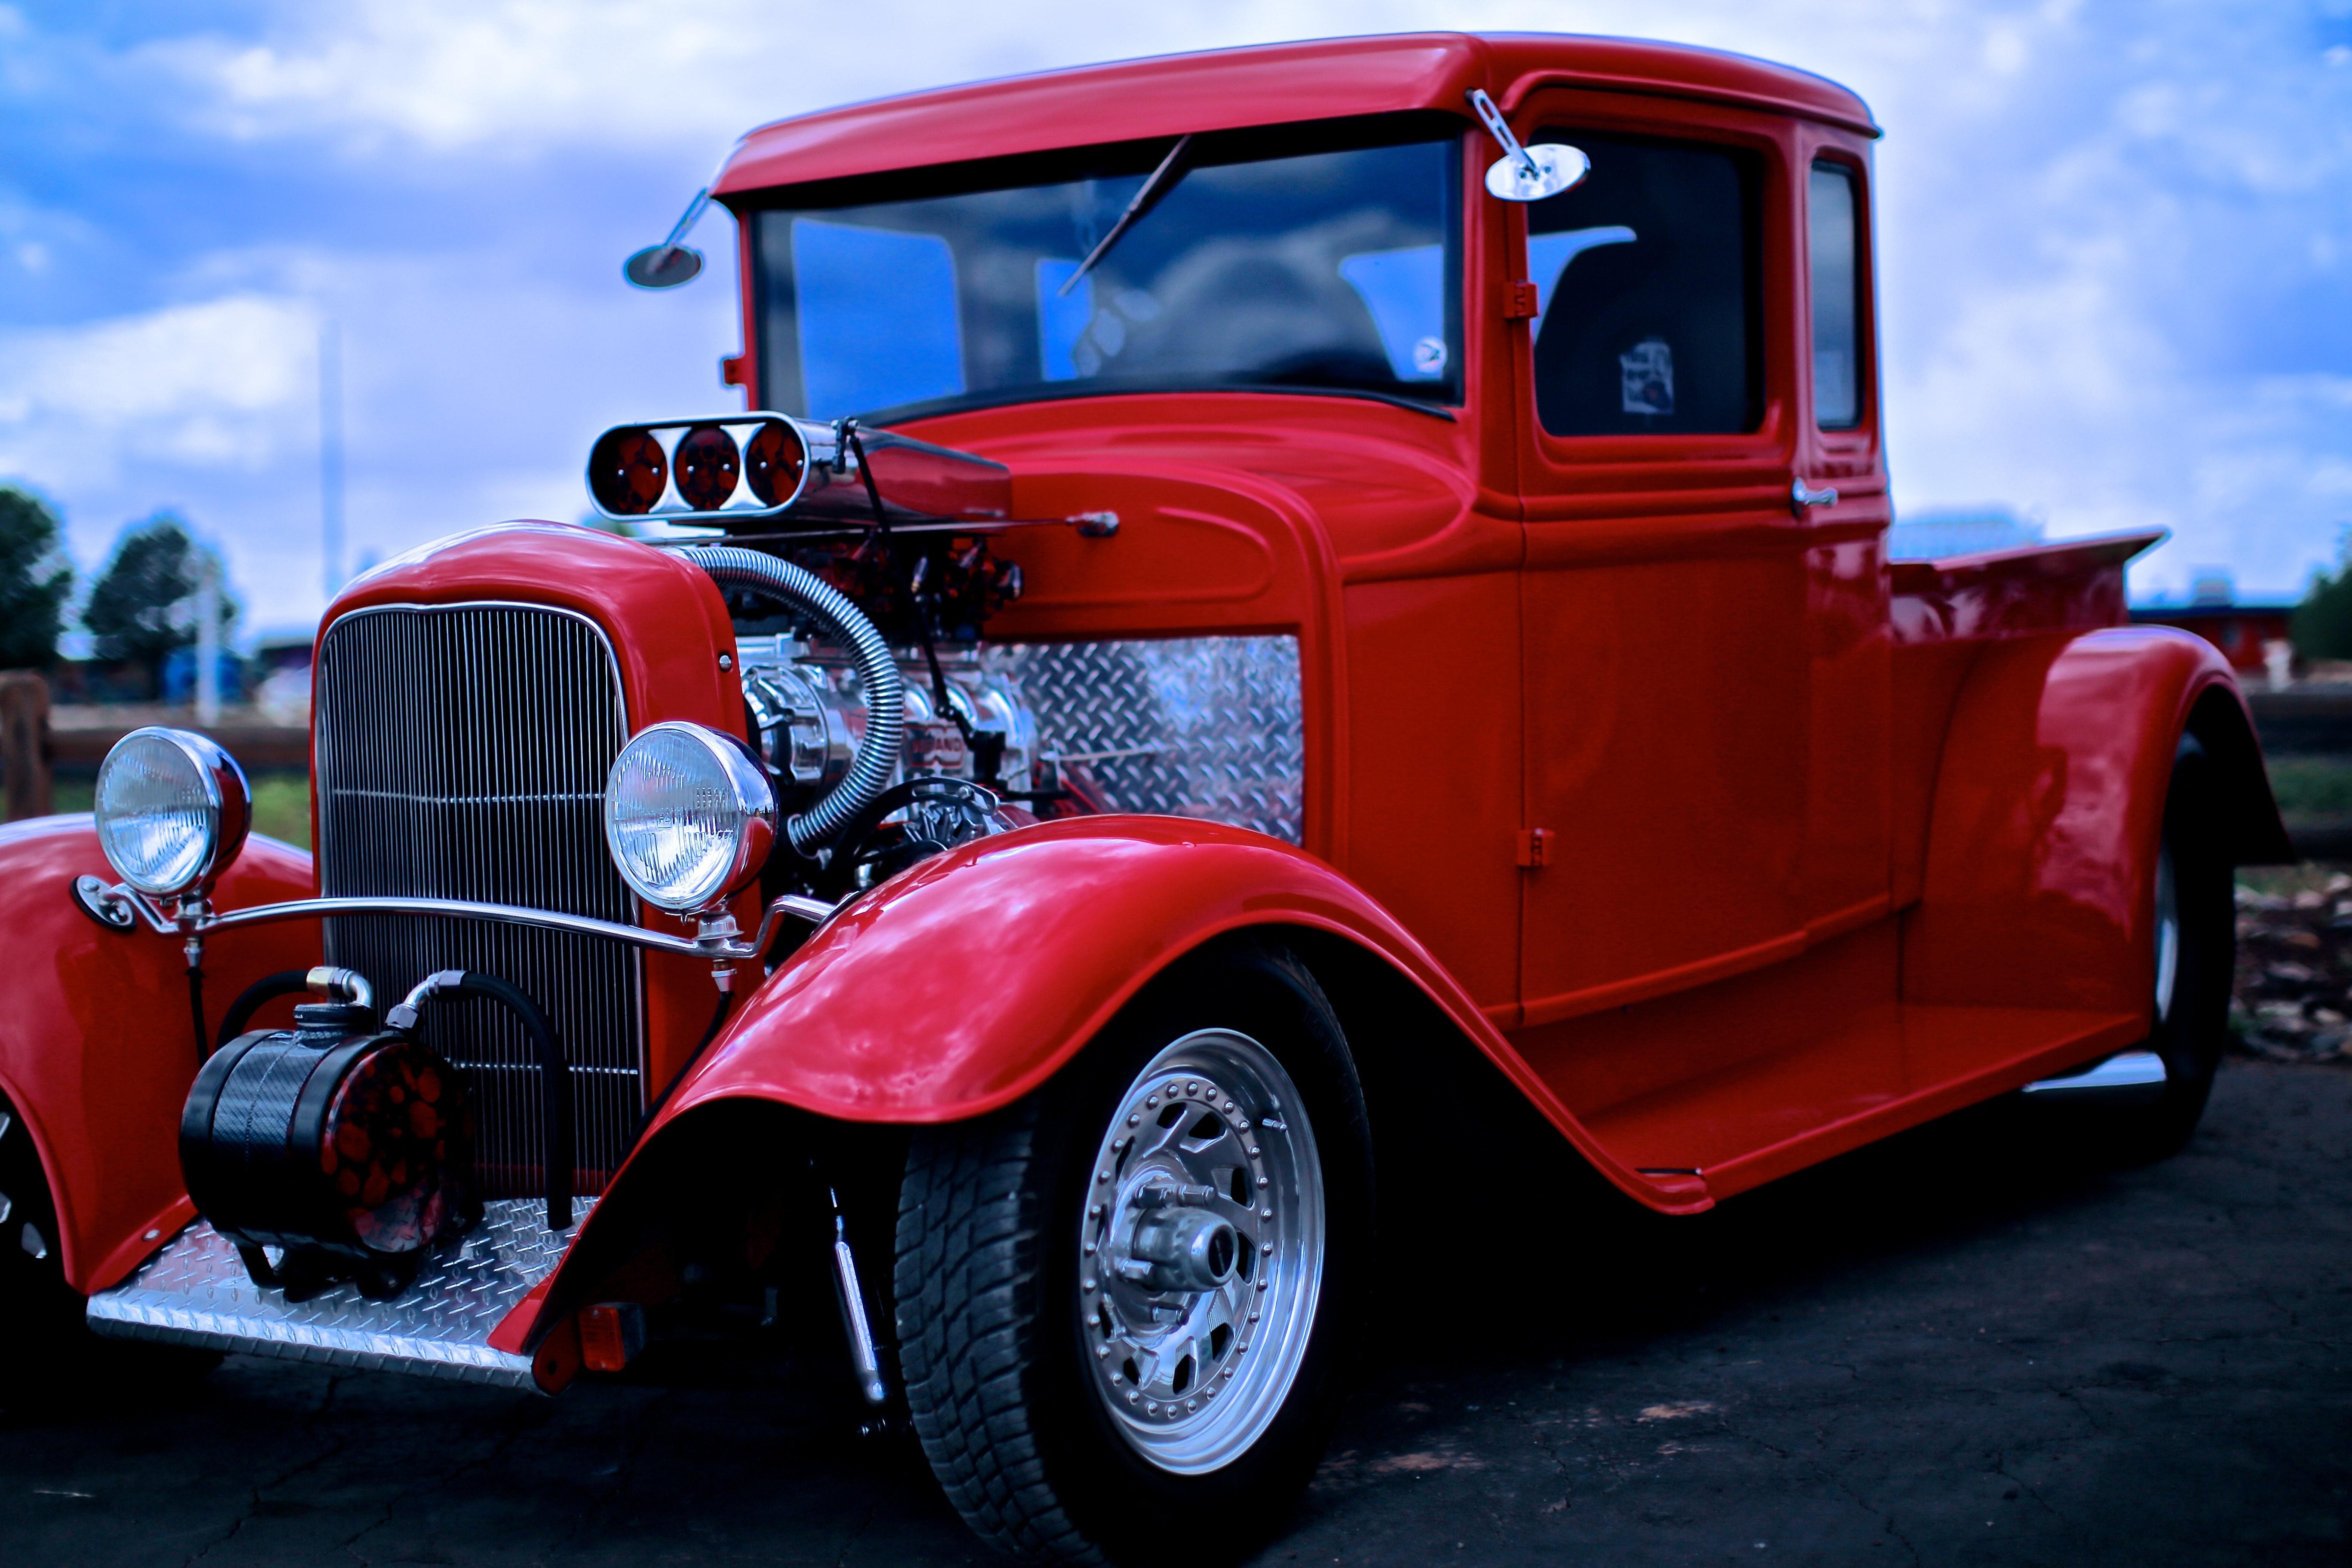 Vintage Car · Free Stock Photo